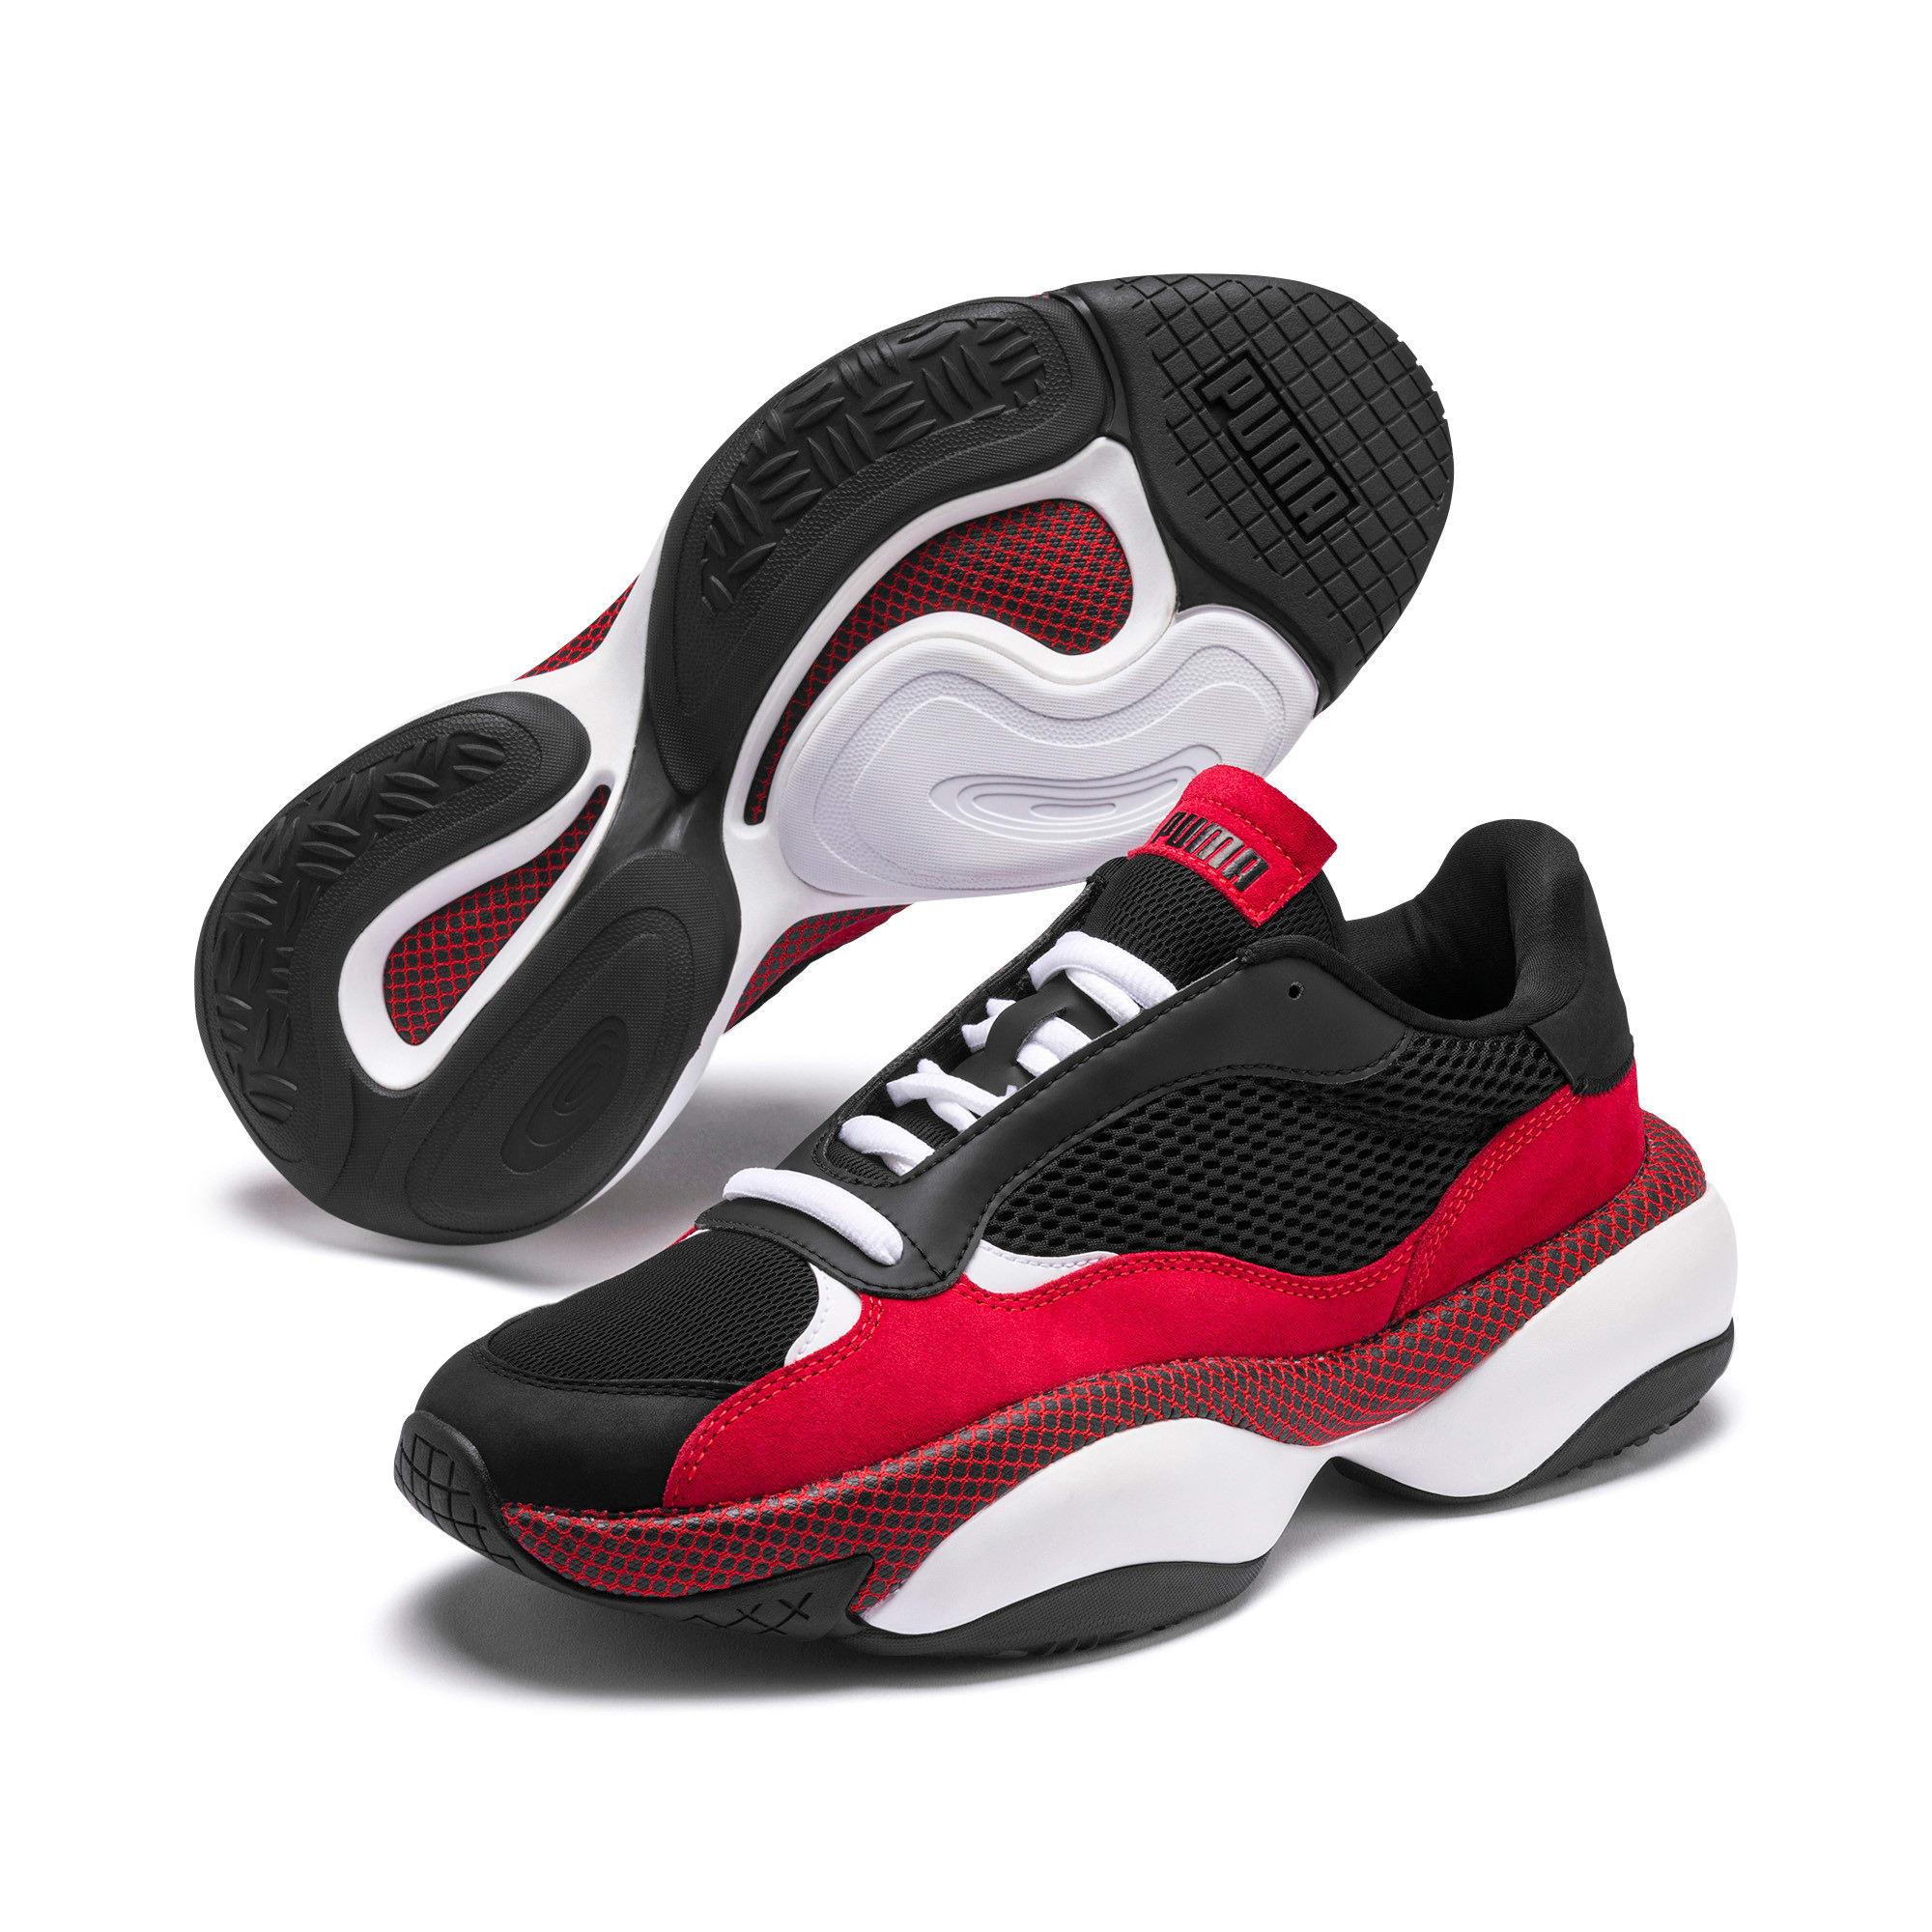 Thumbnail 3 of Alteration Blitz Sneakers, Puma Black-High Risk Red, medium